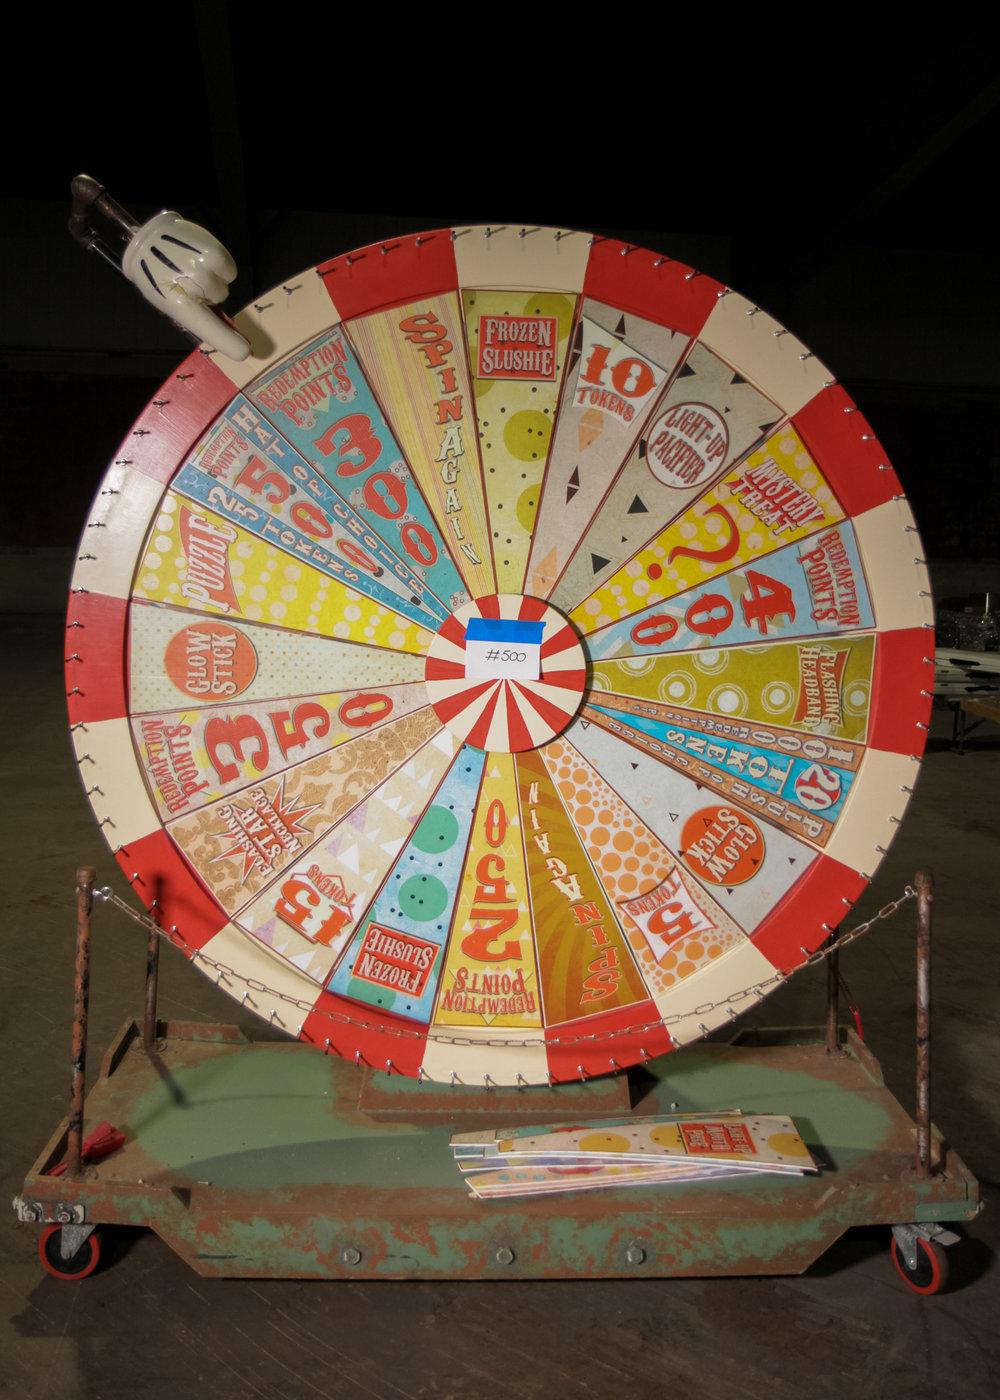 6' Diameter Custom Built Prize/Party Wheel